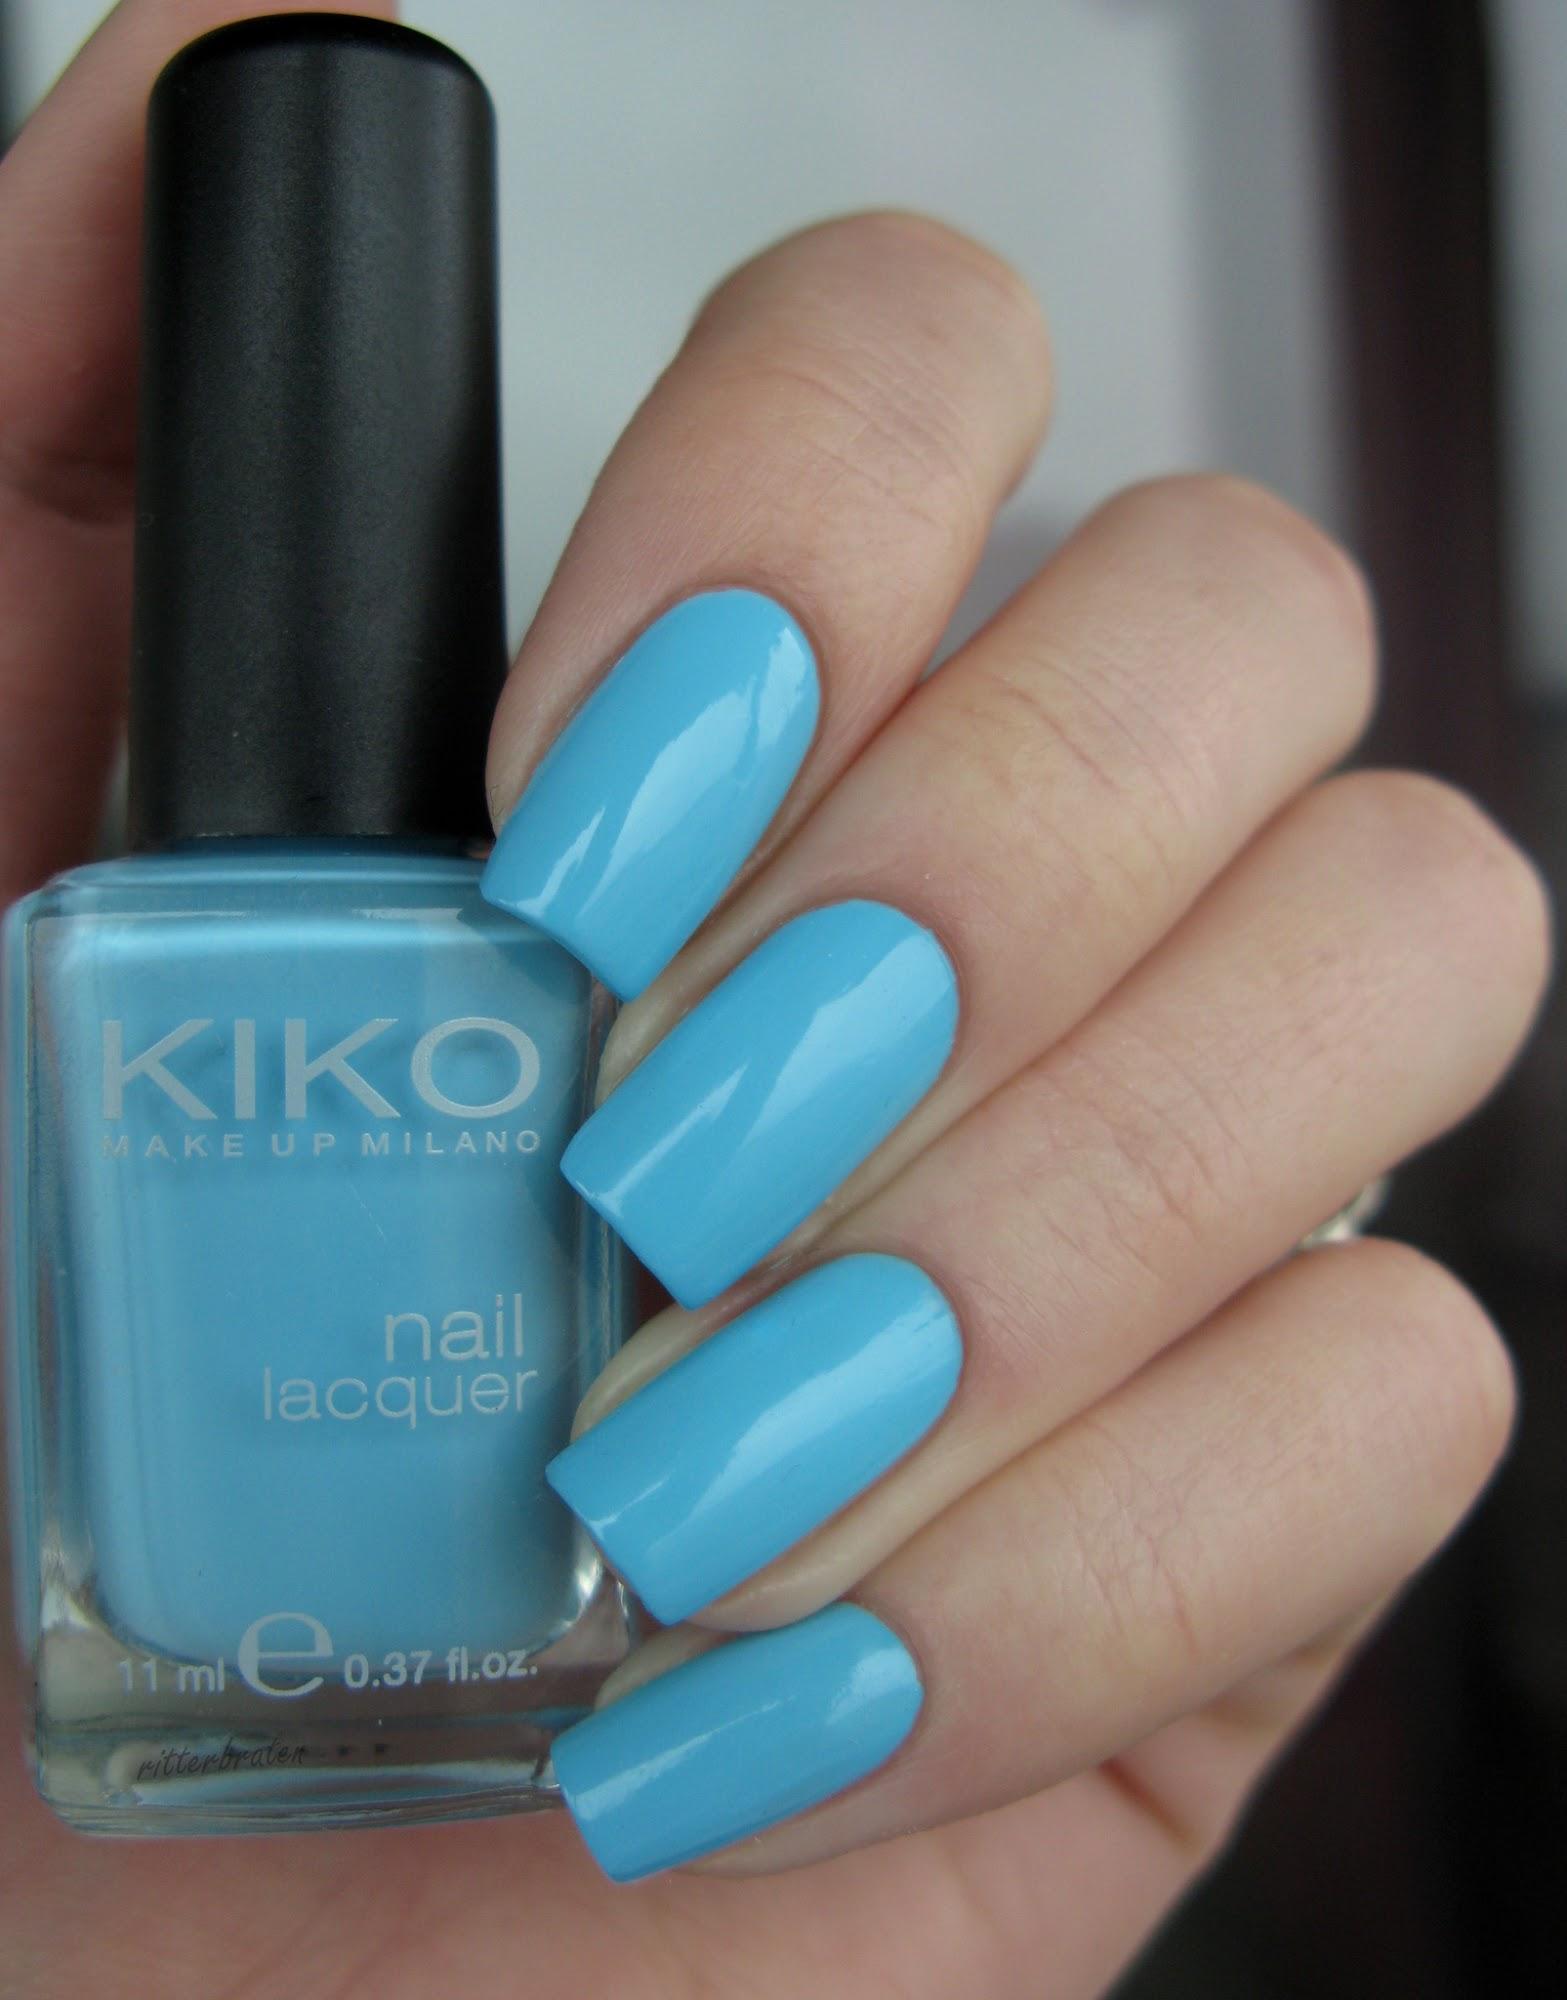 Kiko 340